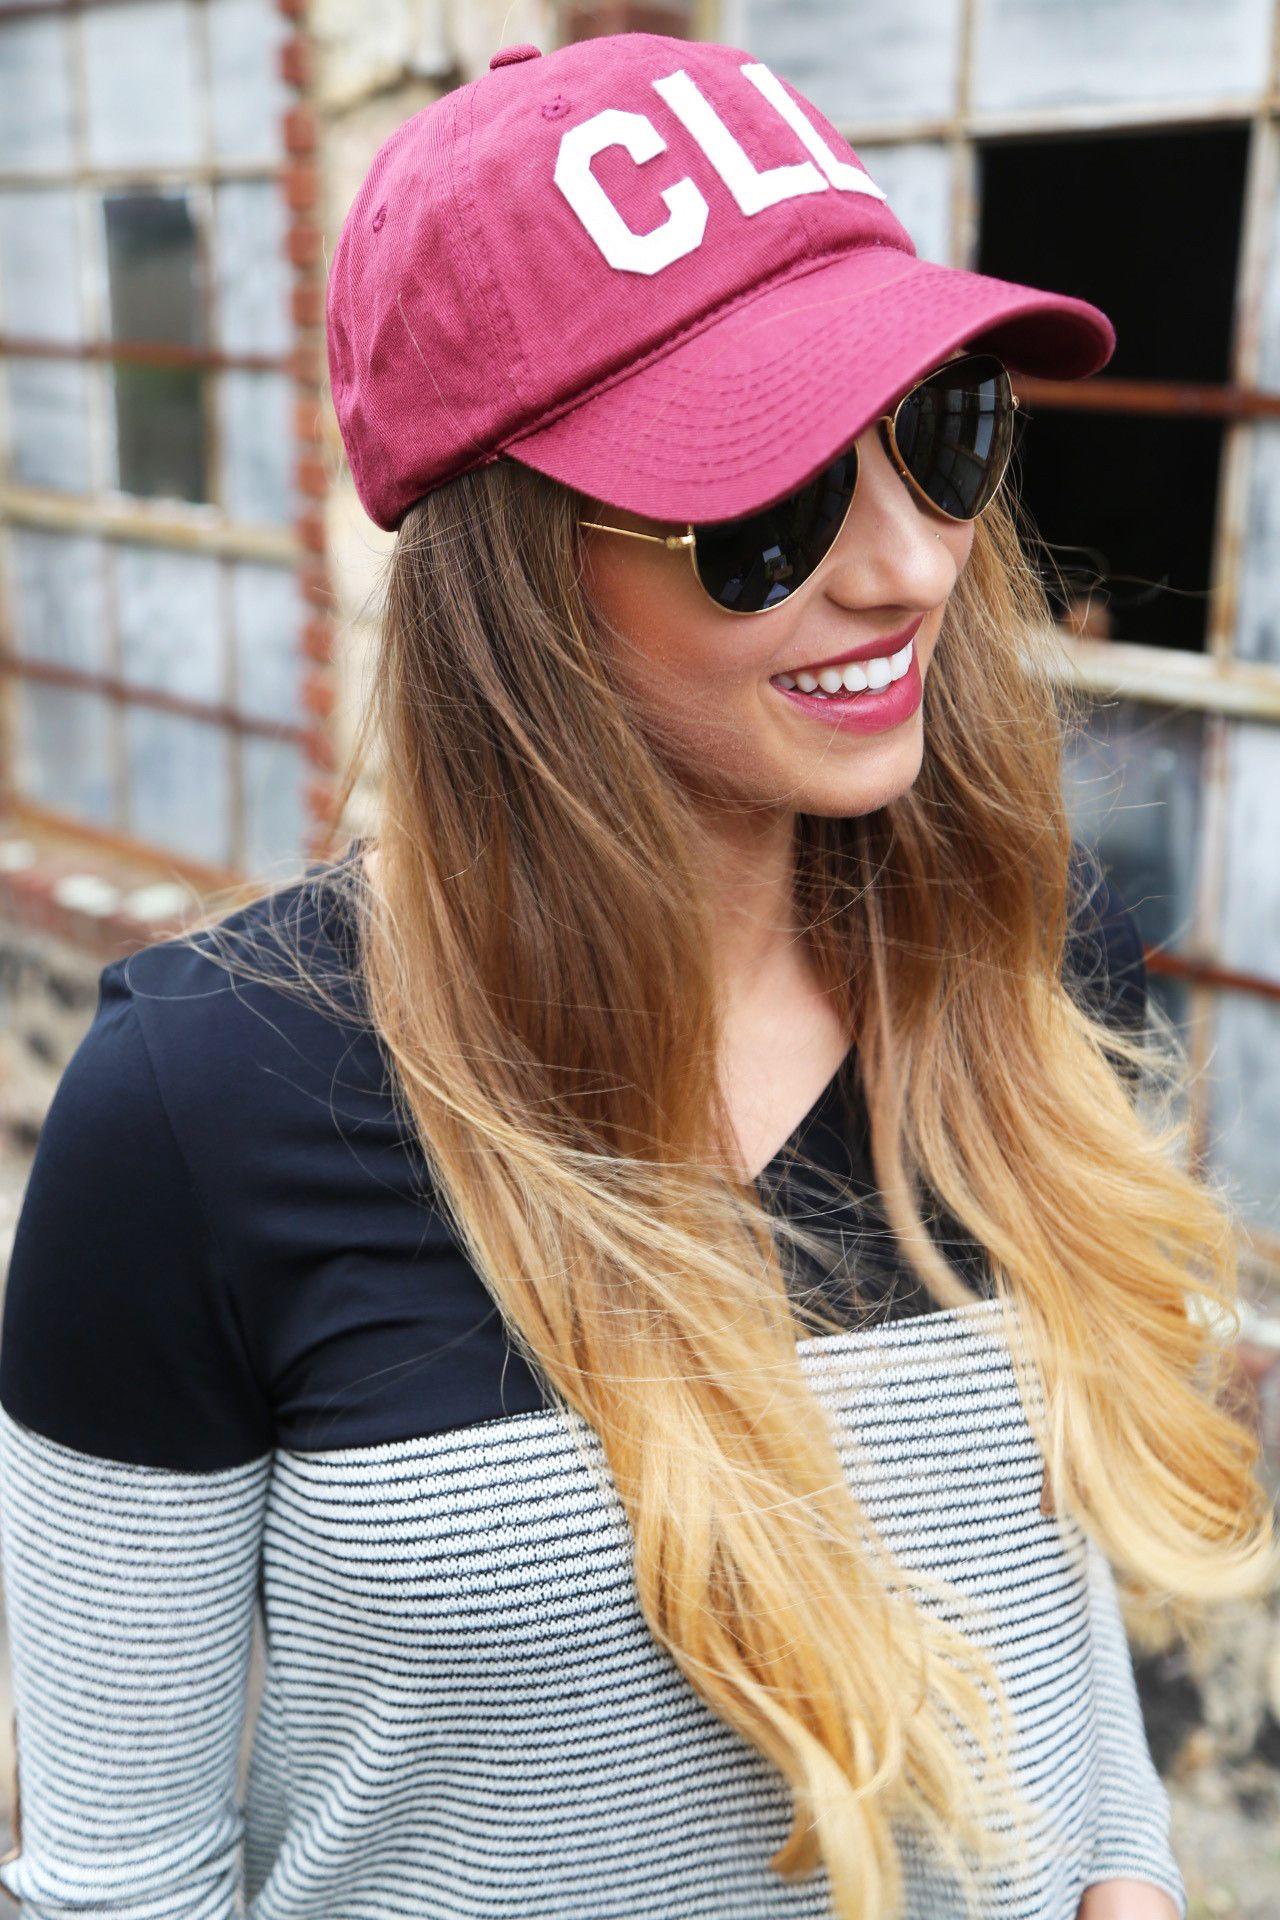 Aviate Ball Cap Cll Red Products Fashion Cap Cap Girl